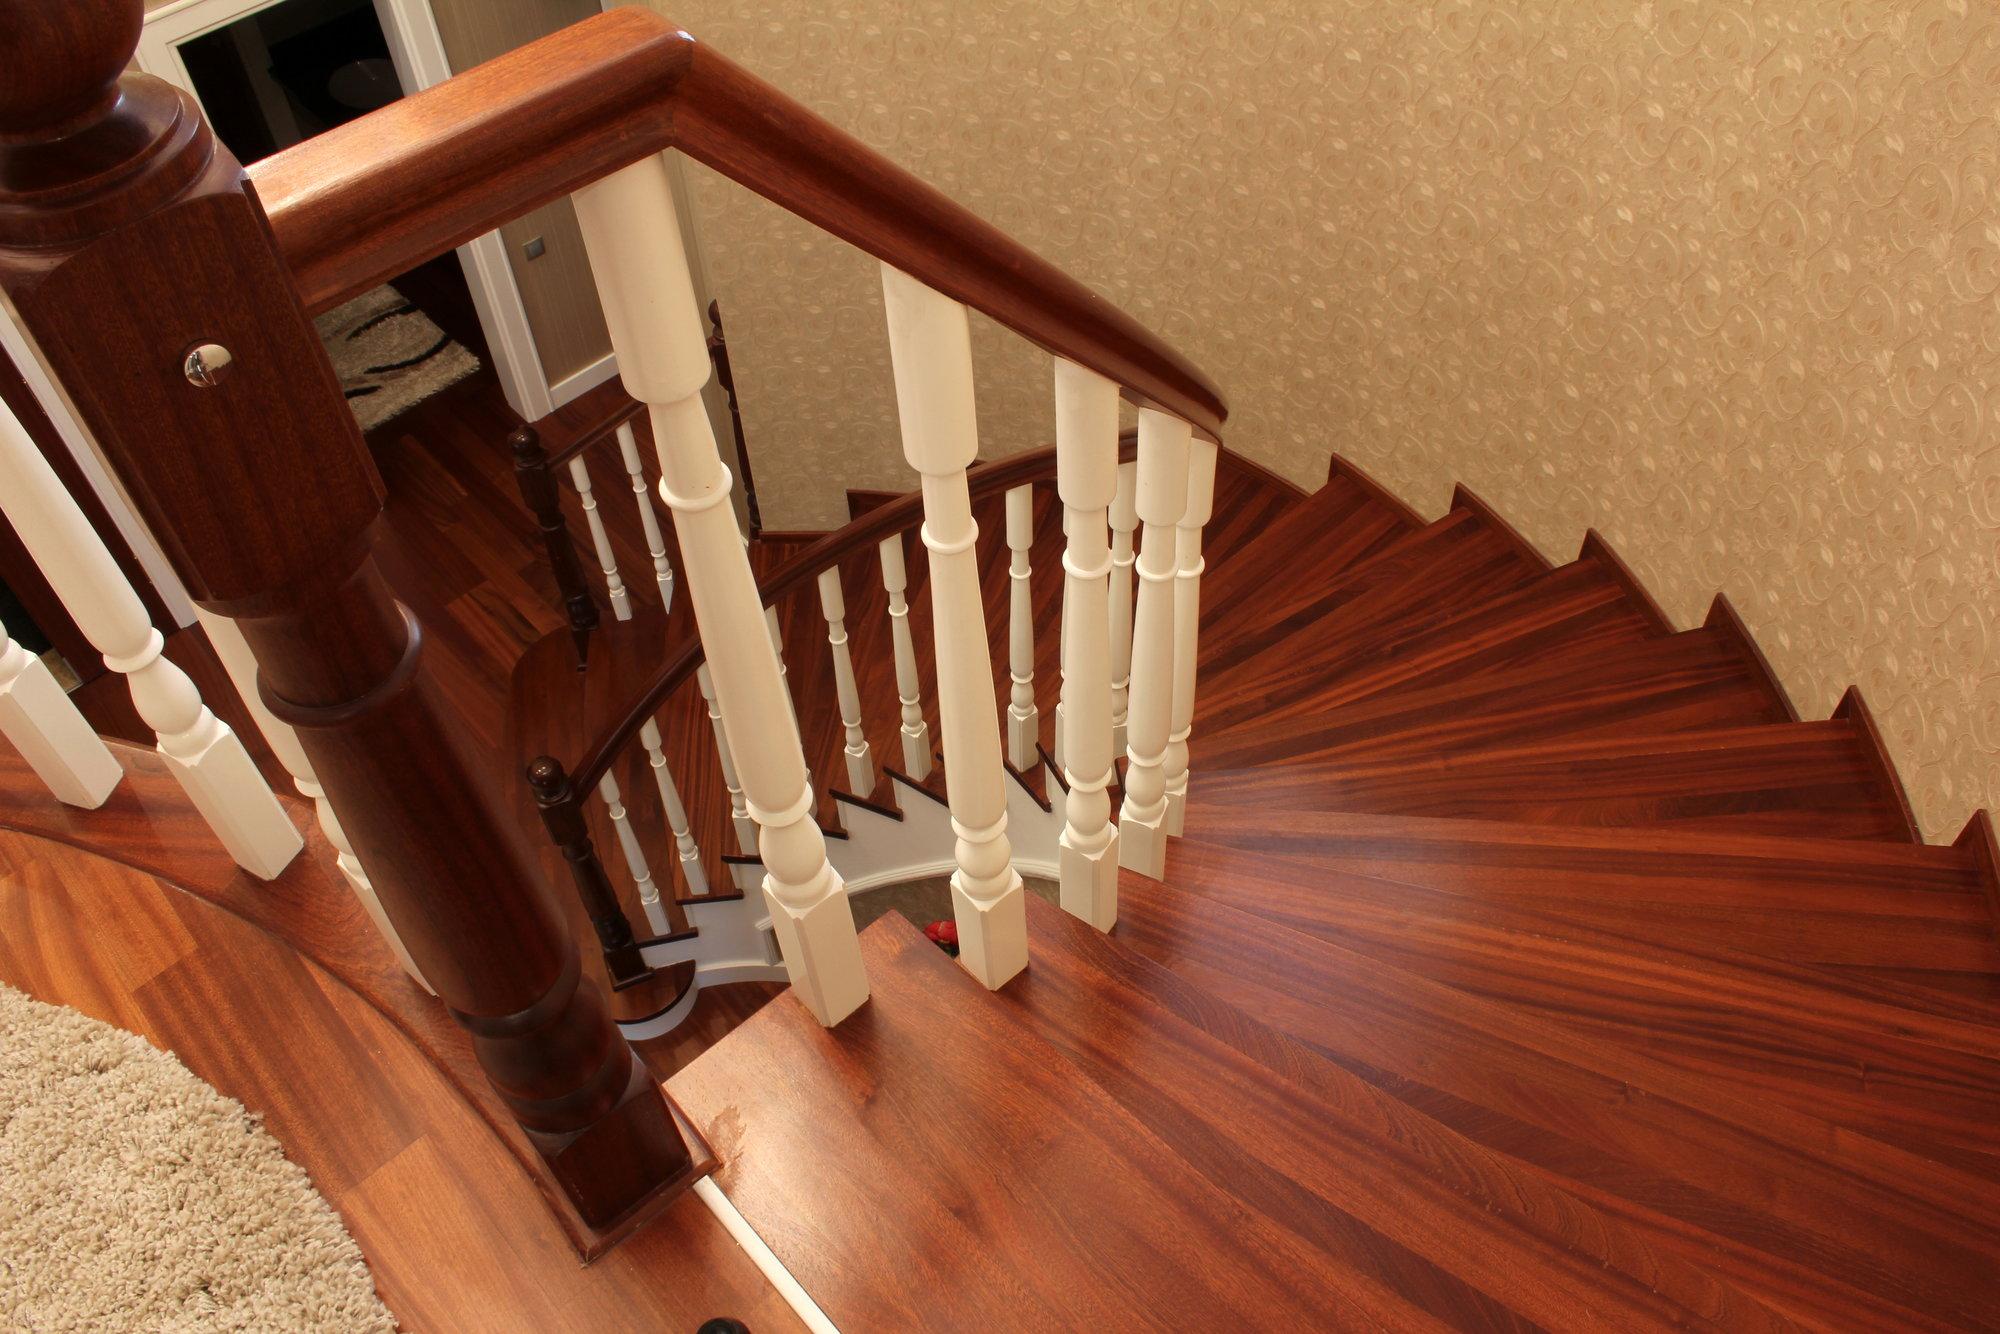 How to Repair Loose Wood Stair Railings   DoItYourself.com